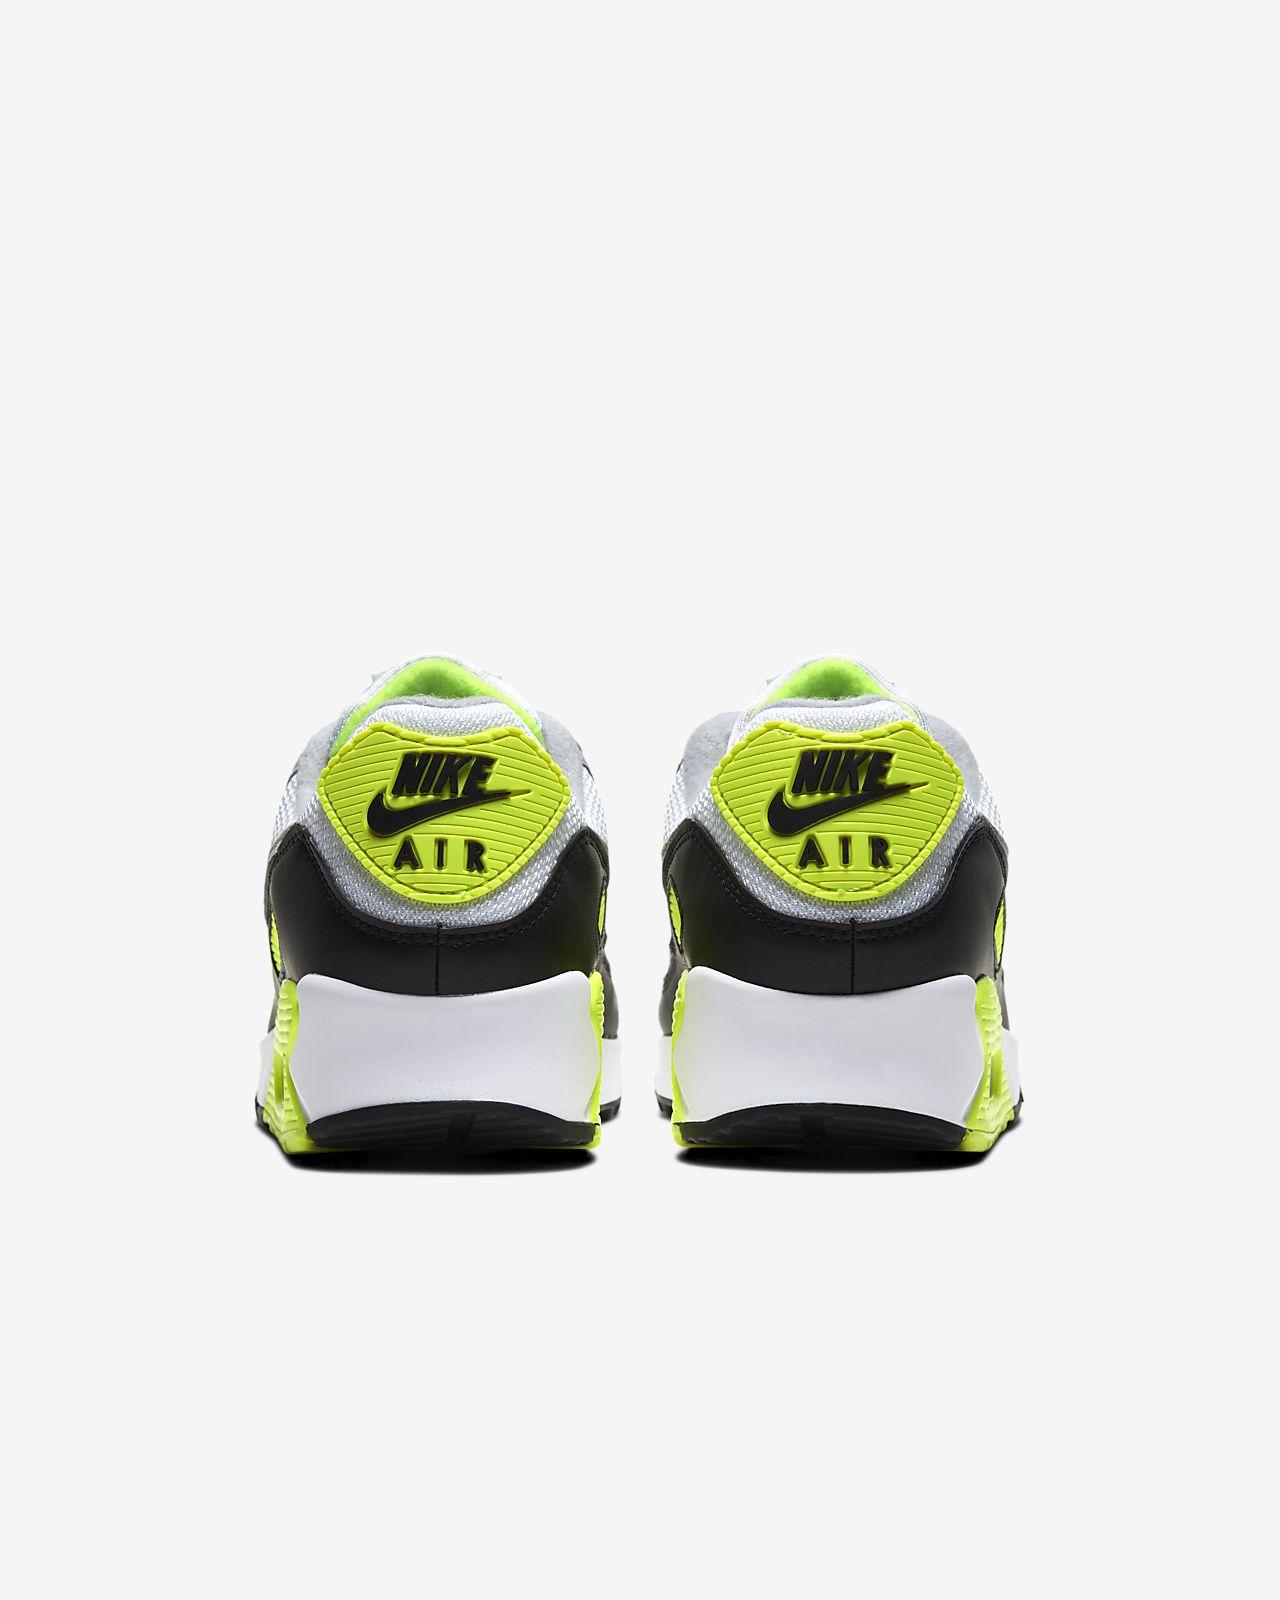 Scarpa Nike Air Max 90 Uomo